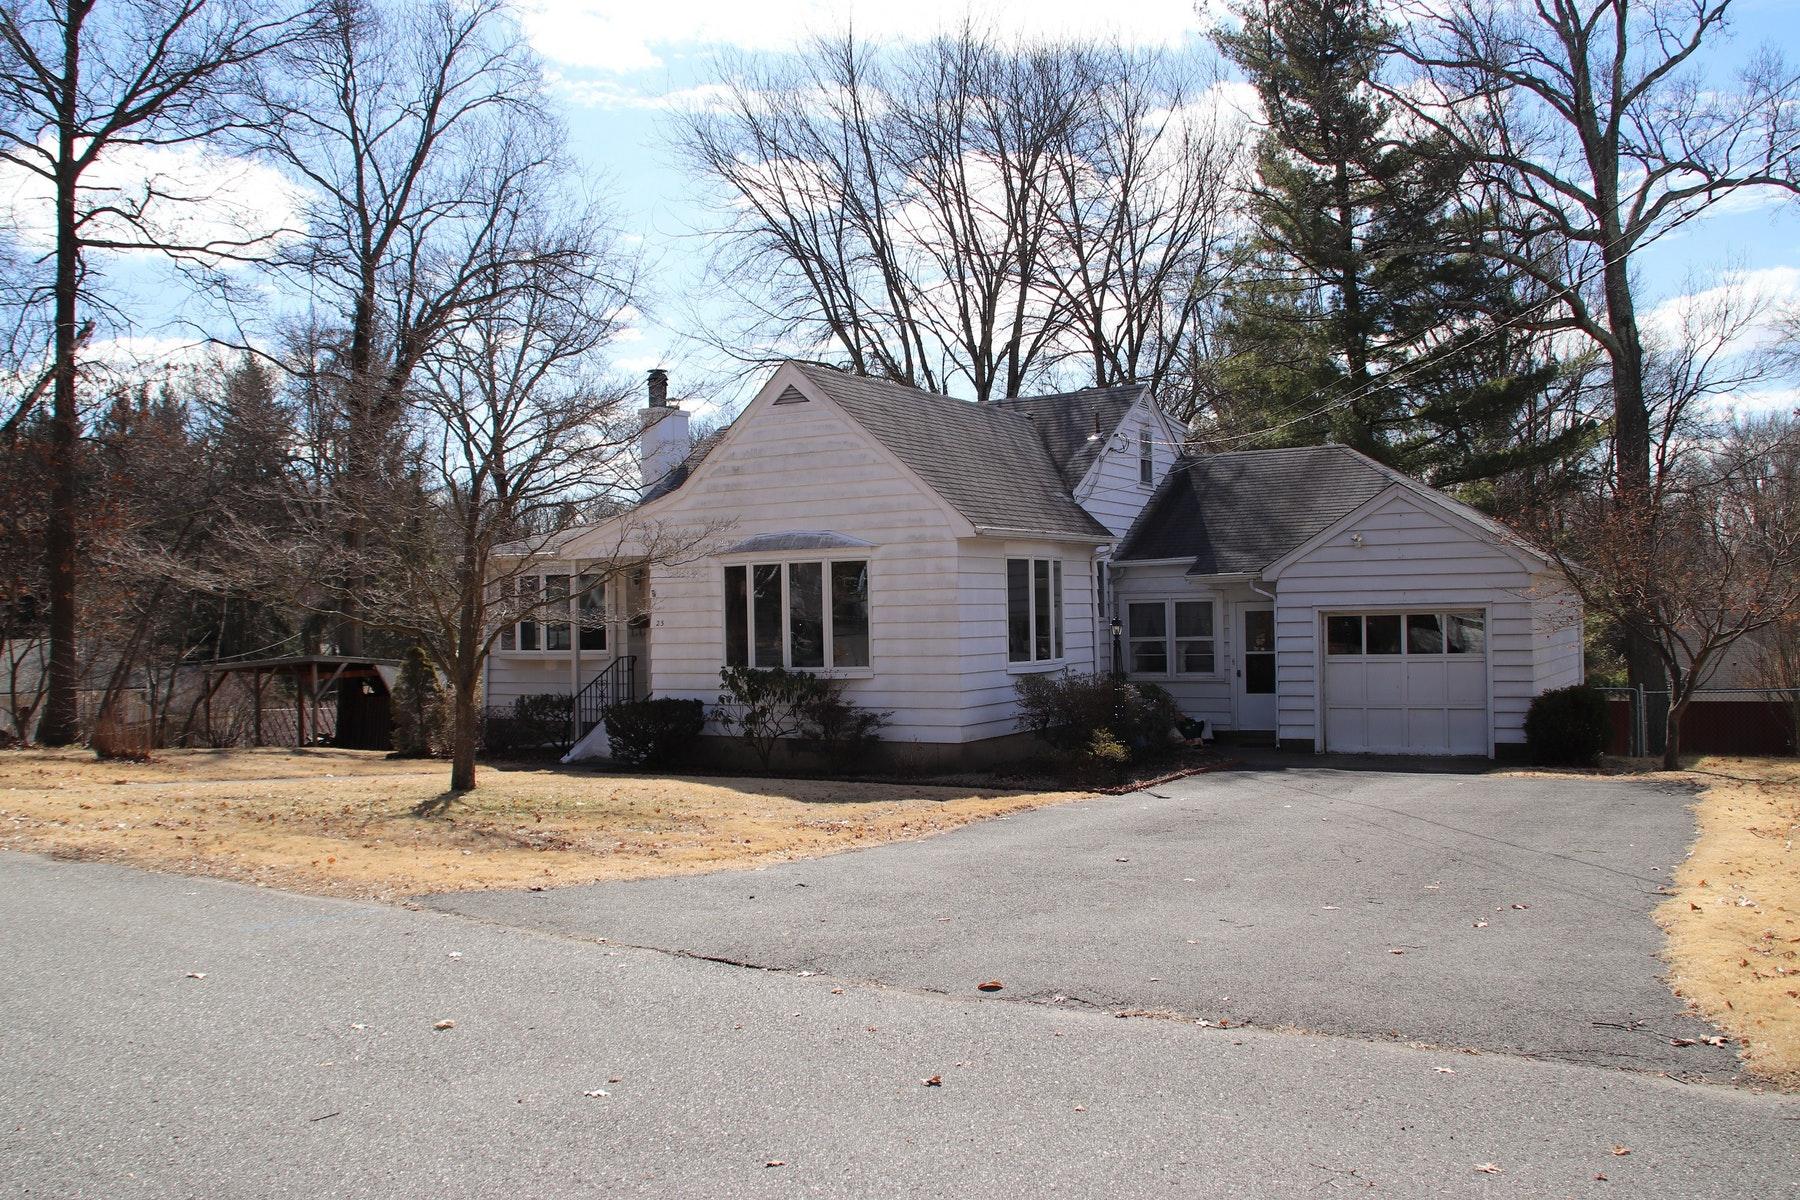 Nhà ở một gia đình vì Bán tại A Lovely Four Bedroom On A Quite Cul-De-Sac In Allendale. 25 Vreeland Place Allendale, New Jersey 07401 Hoa Kỳ